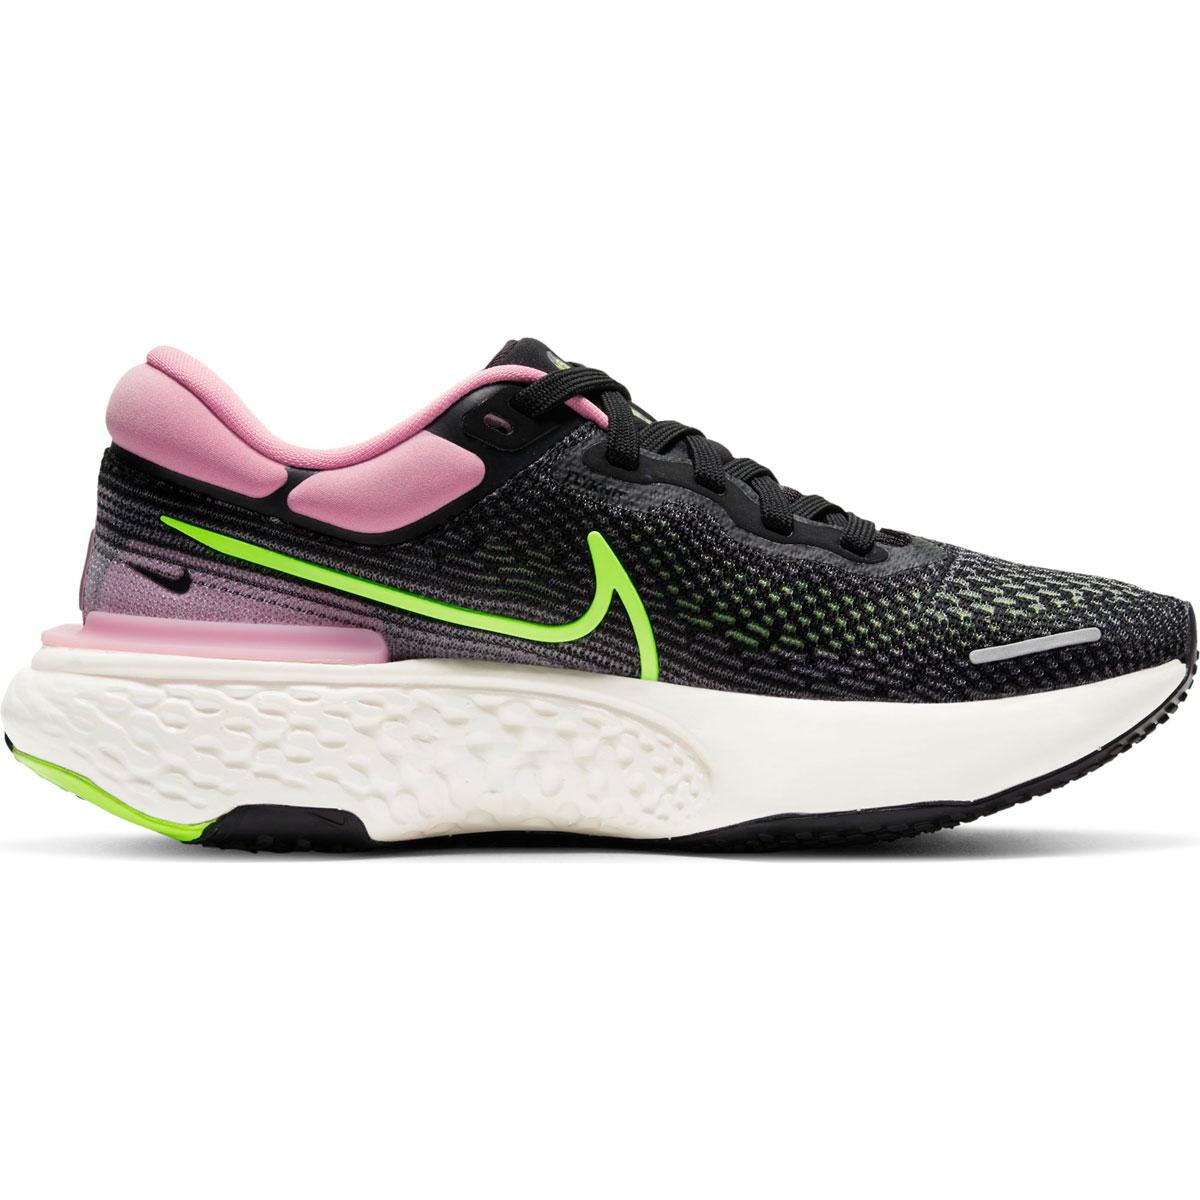 Women's Nike Zoomx Invincible Run FlyKnit Running Shoe - Color: Black/Cyber/Elemental Pink - Size: 6 - Width: Regular, Black/Cyber/Elemental Pink, large, image 1